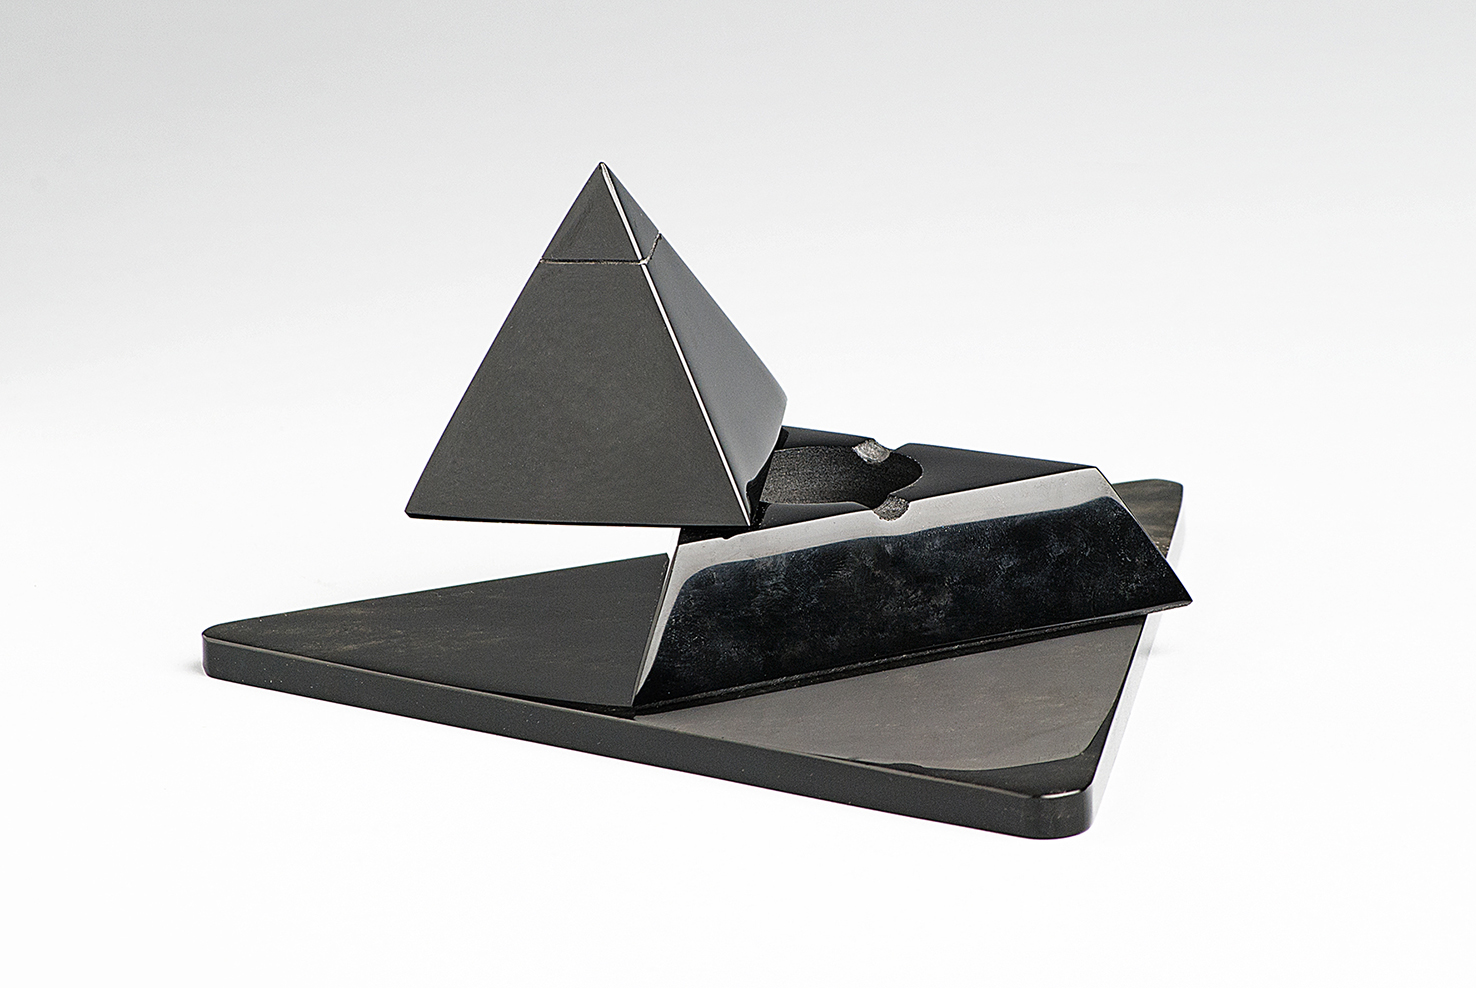 web2-Obsidian_DSC0054a-Anahuac-Mexico-Design-Time-Marion-Friedmann.jpg